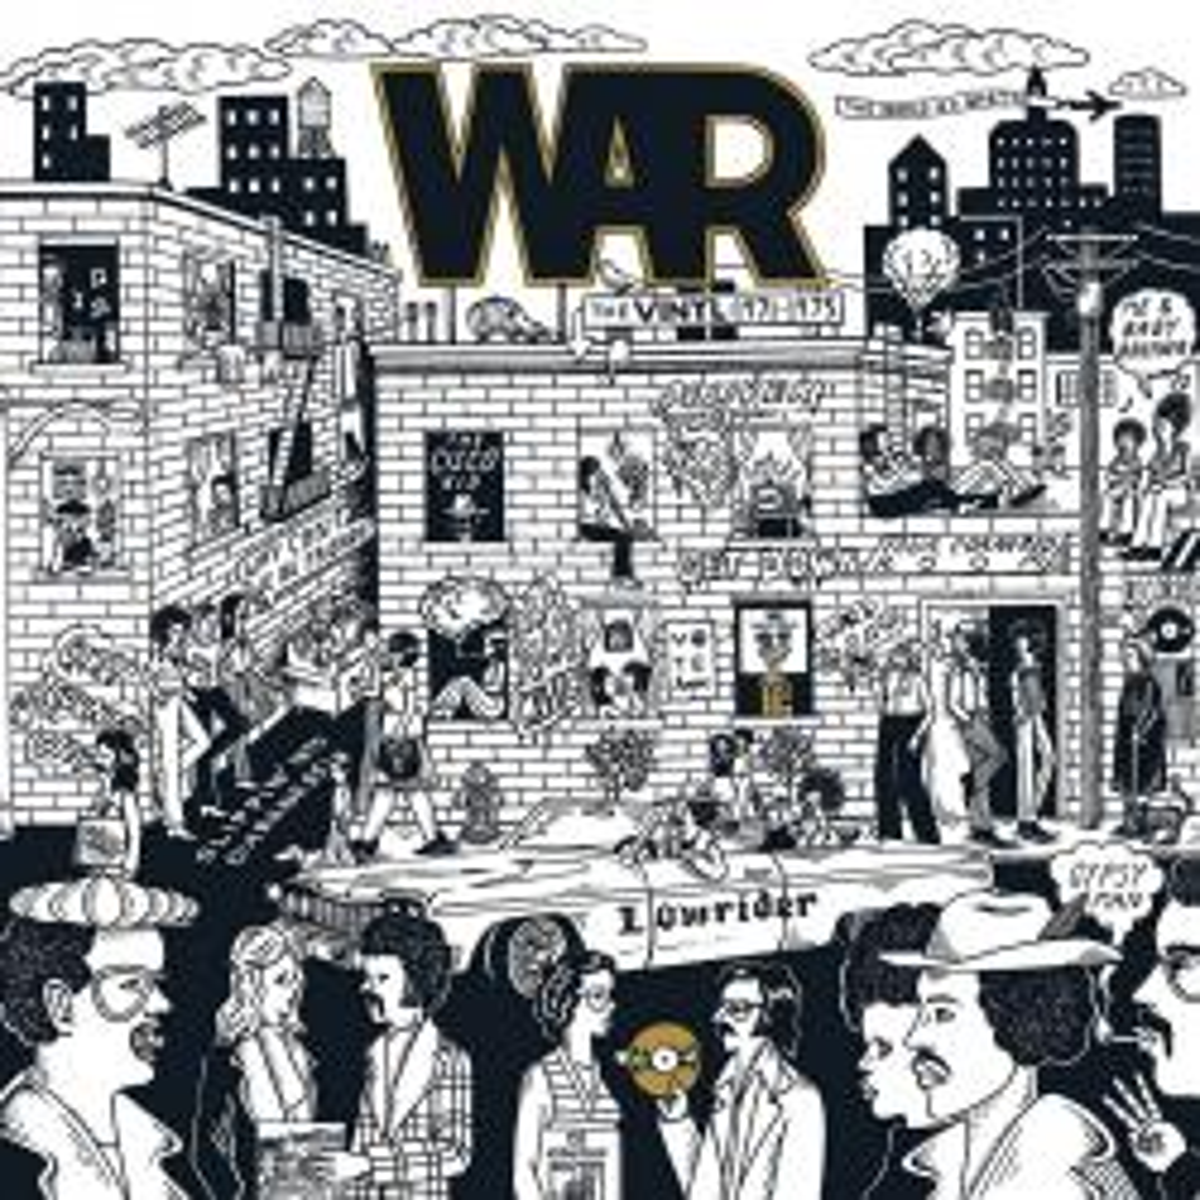 Виниловая пластинка WAR - Give Me Five! The War Albums (1971-1975) (RSD2021/Limited Box Set/Colored Vinyl)